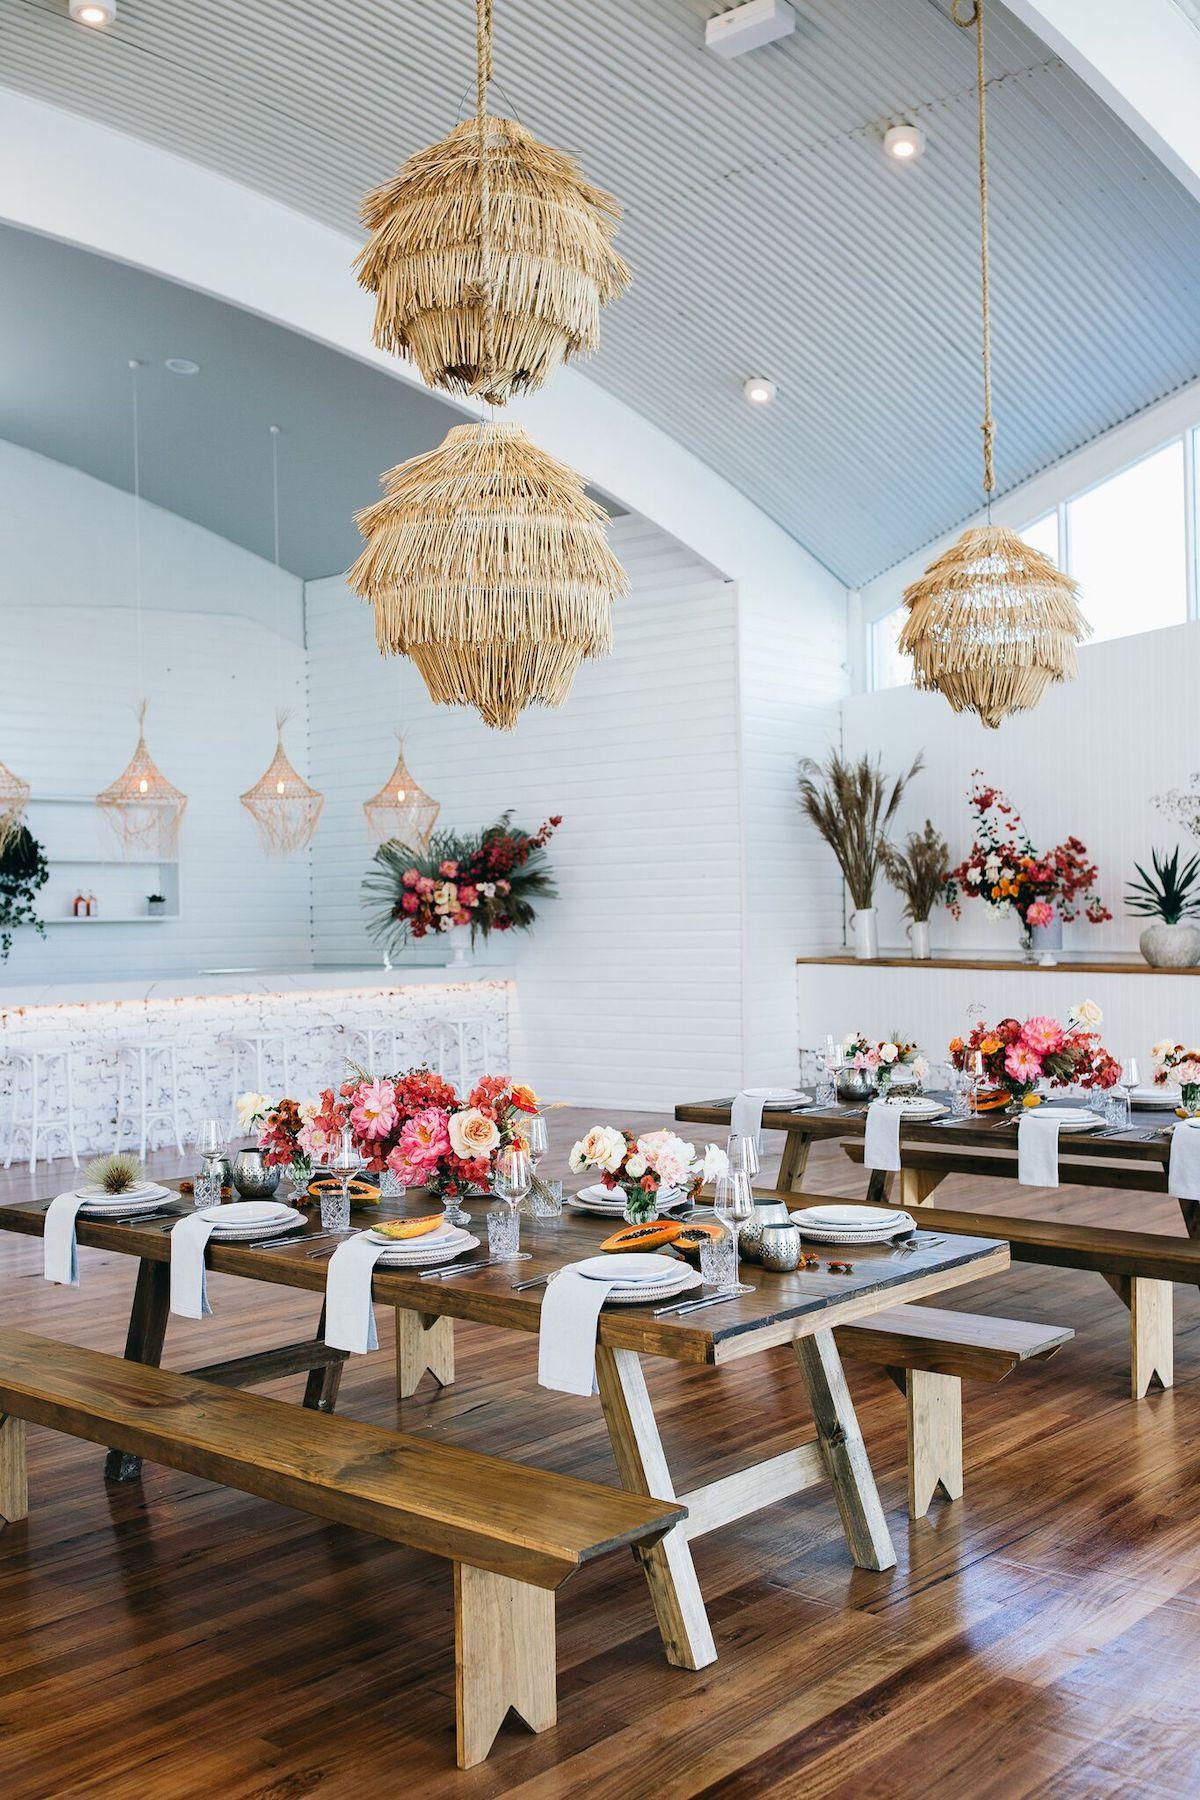 Linen Napkin Hire Wedding Styling Inspiration38.jpeg